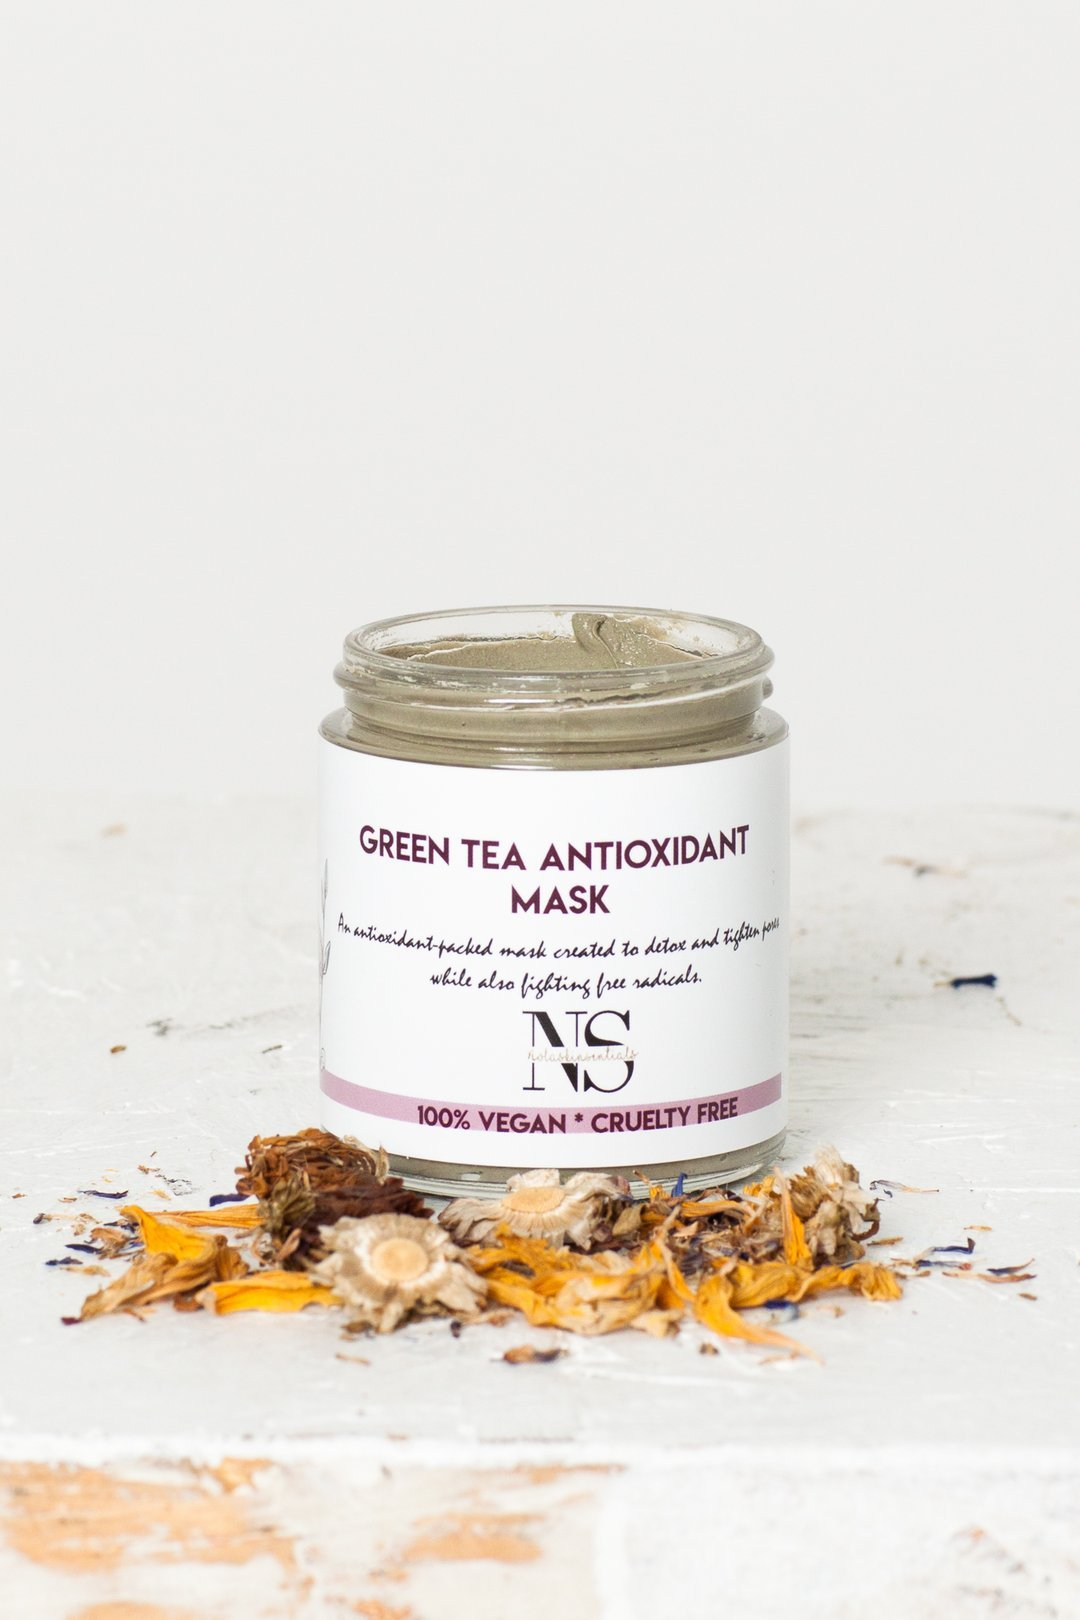 Green Tea Antioxidant Mask